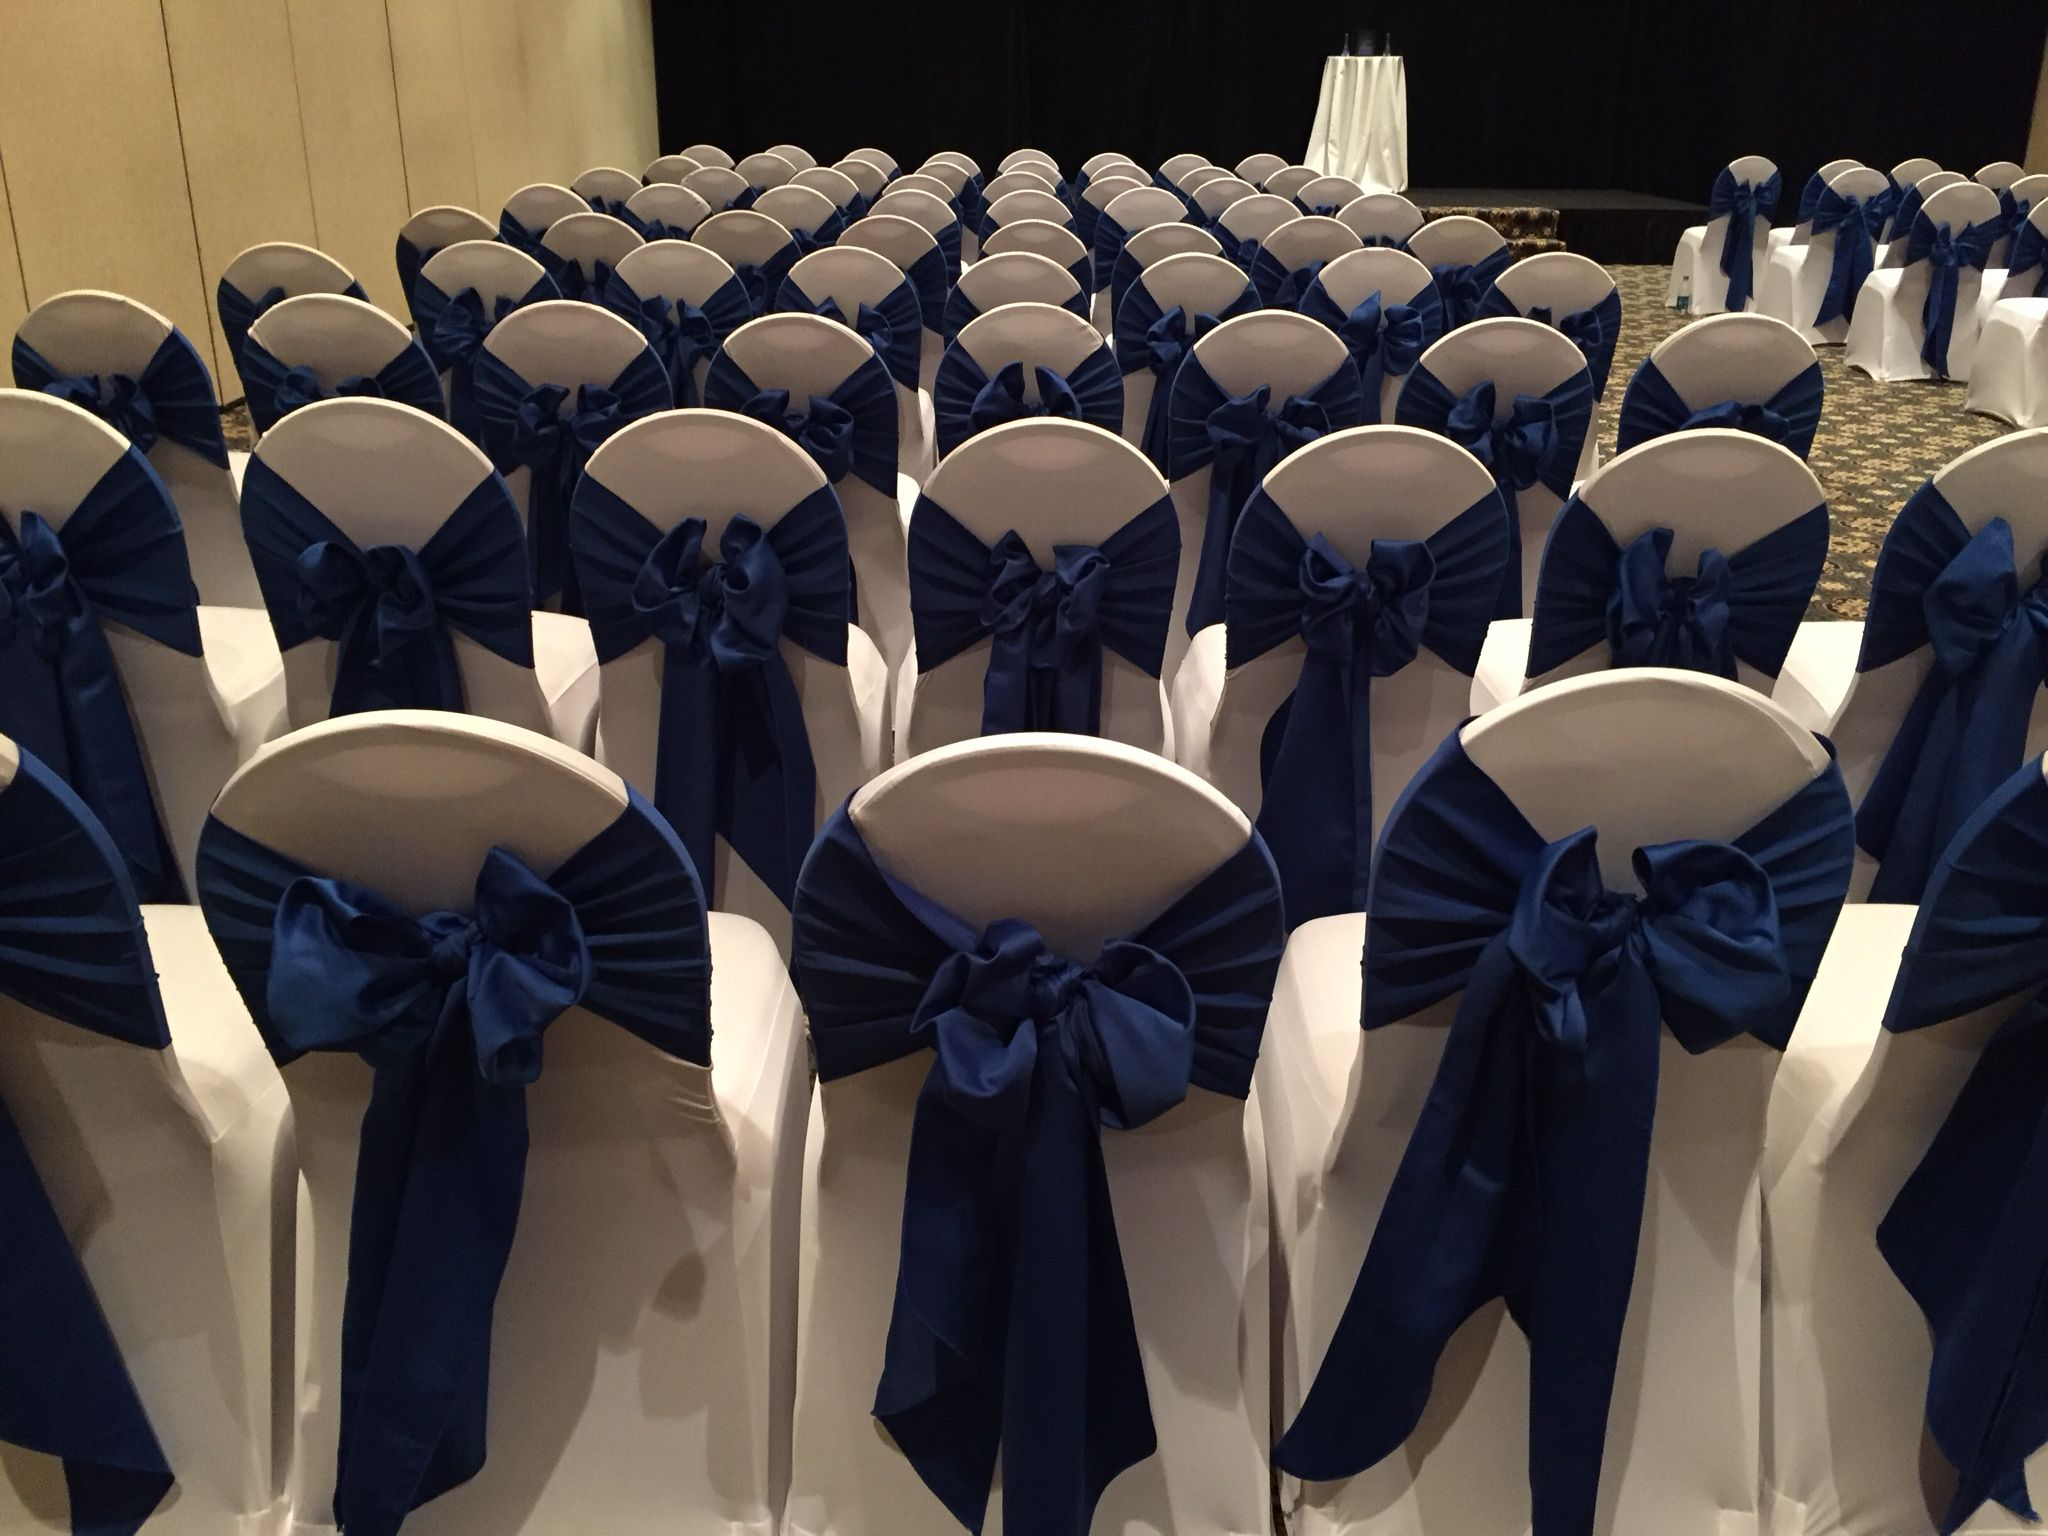 lycra chair covers nz rail molding royal blue sashes spandex